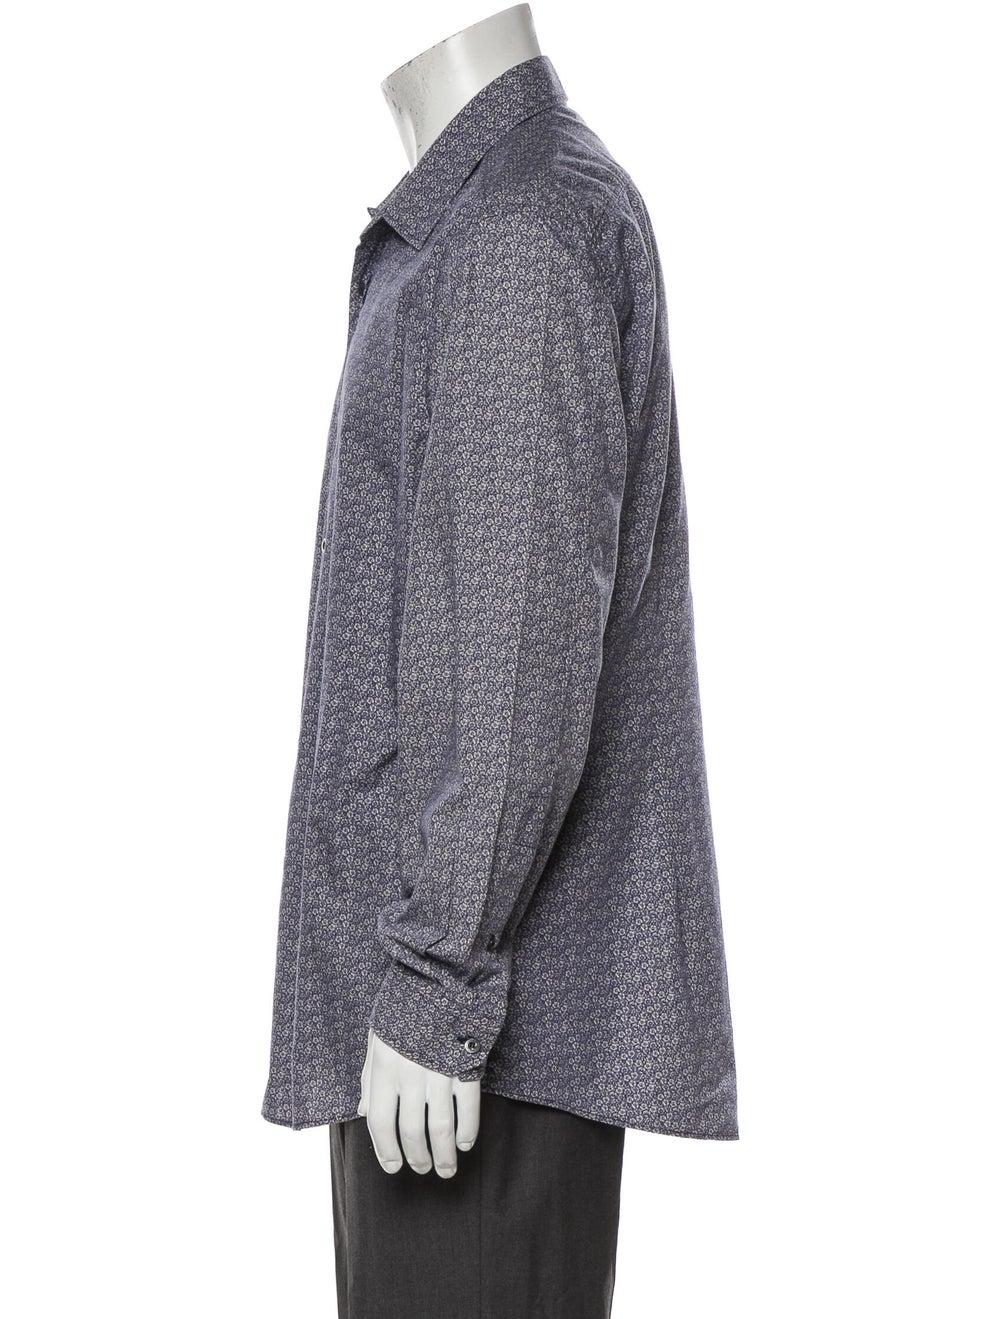 Gucci Floral Print Long Sleeve Shirt Blue - image 2